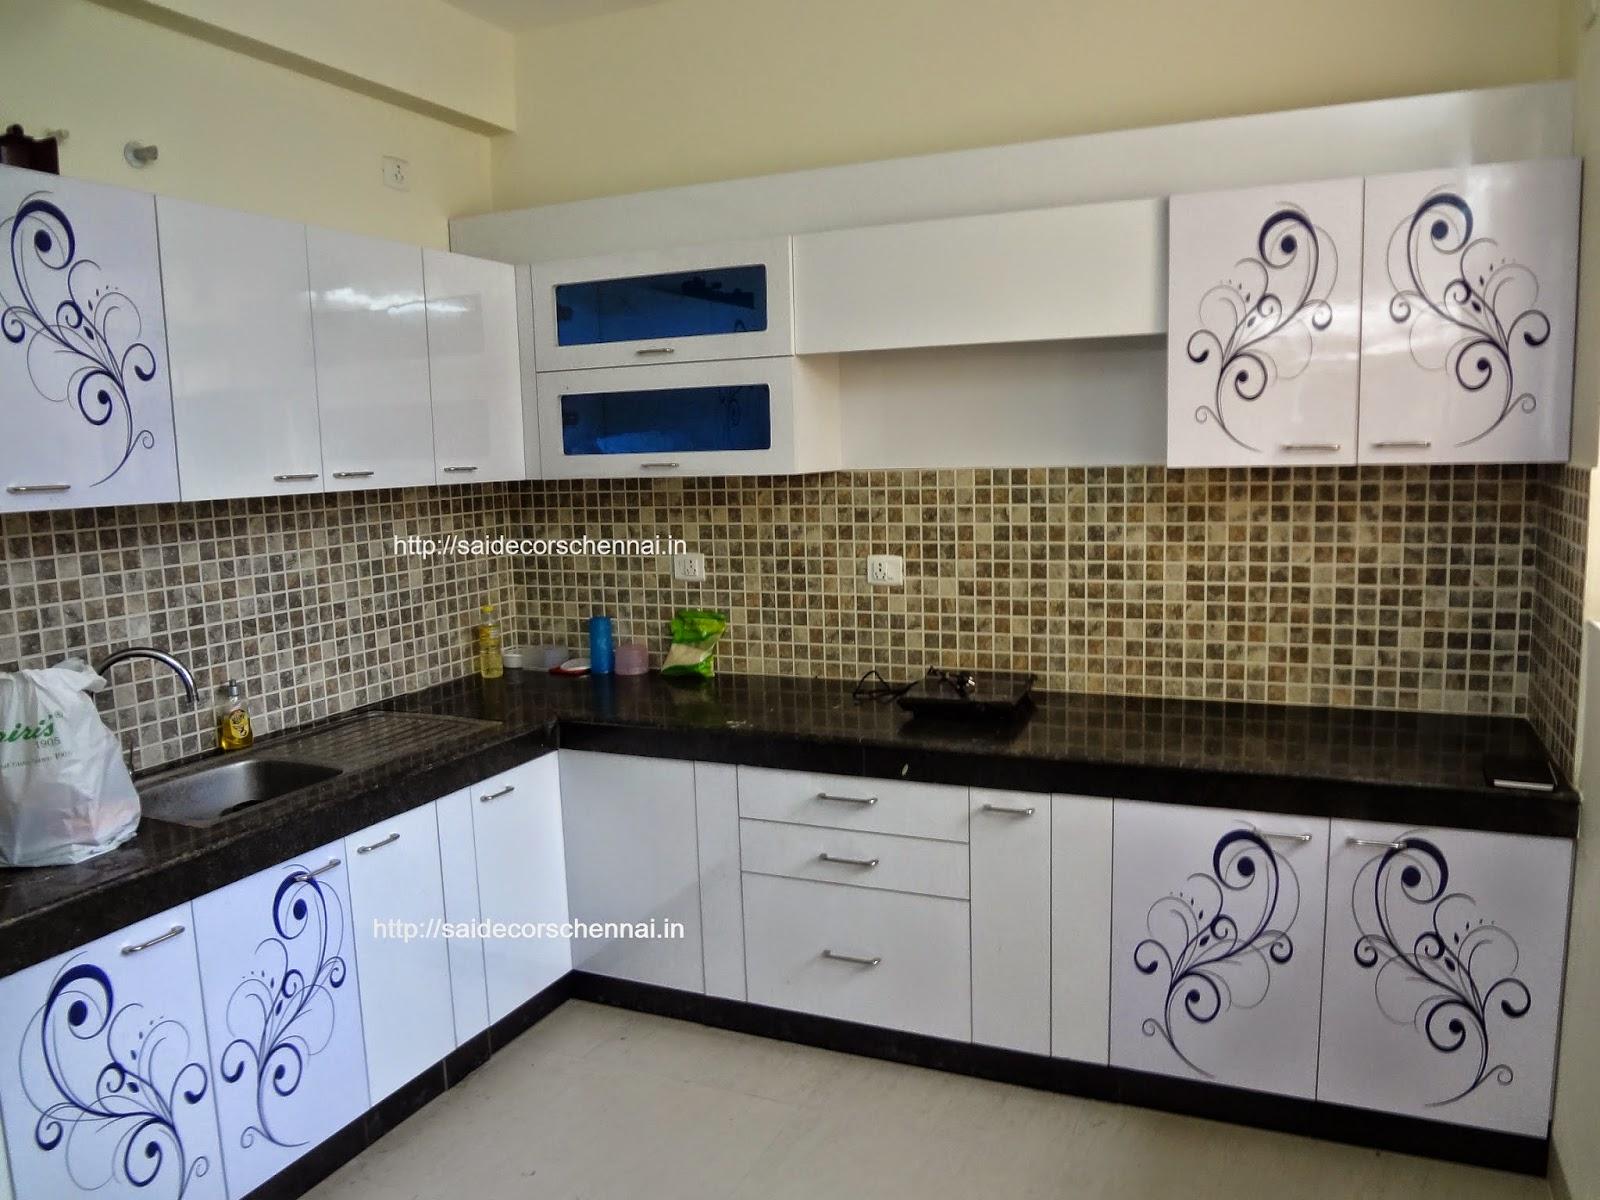 Flower Floral Design Modular Kitchen With Customized Creeper Design